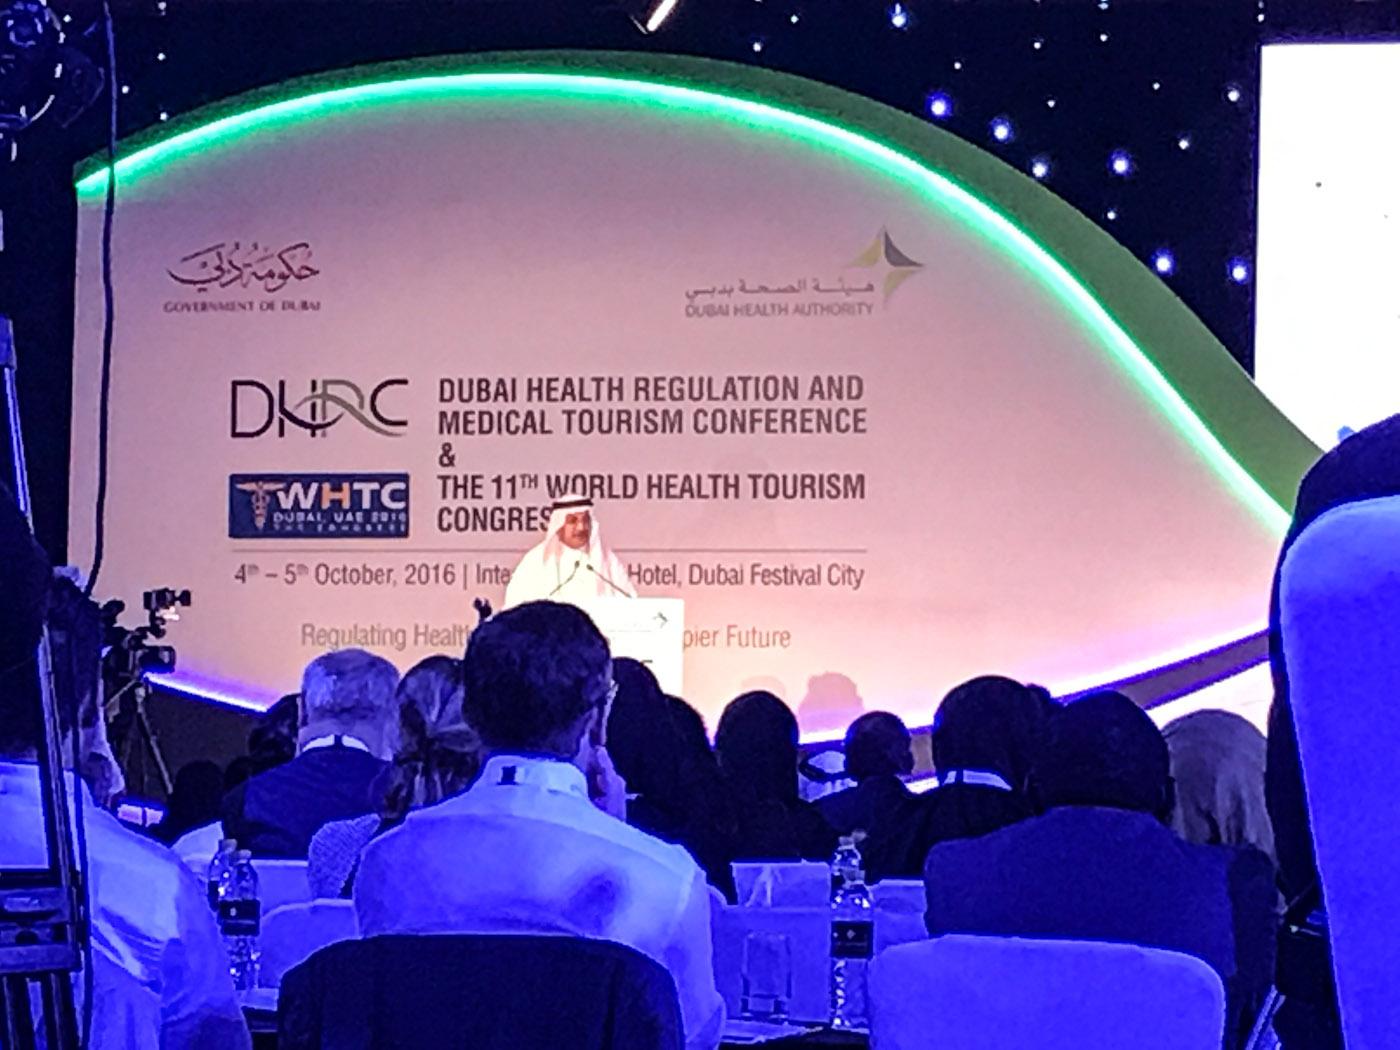 Dubai Health Regulation and Medical Tourism Conference